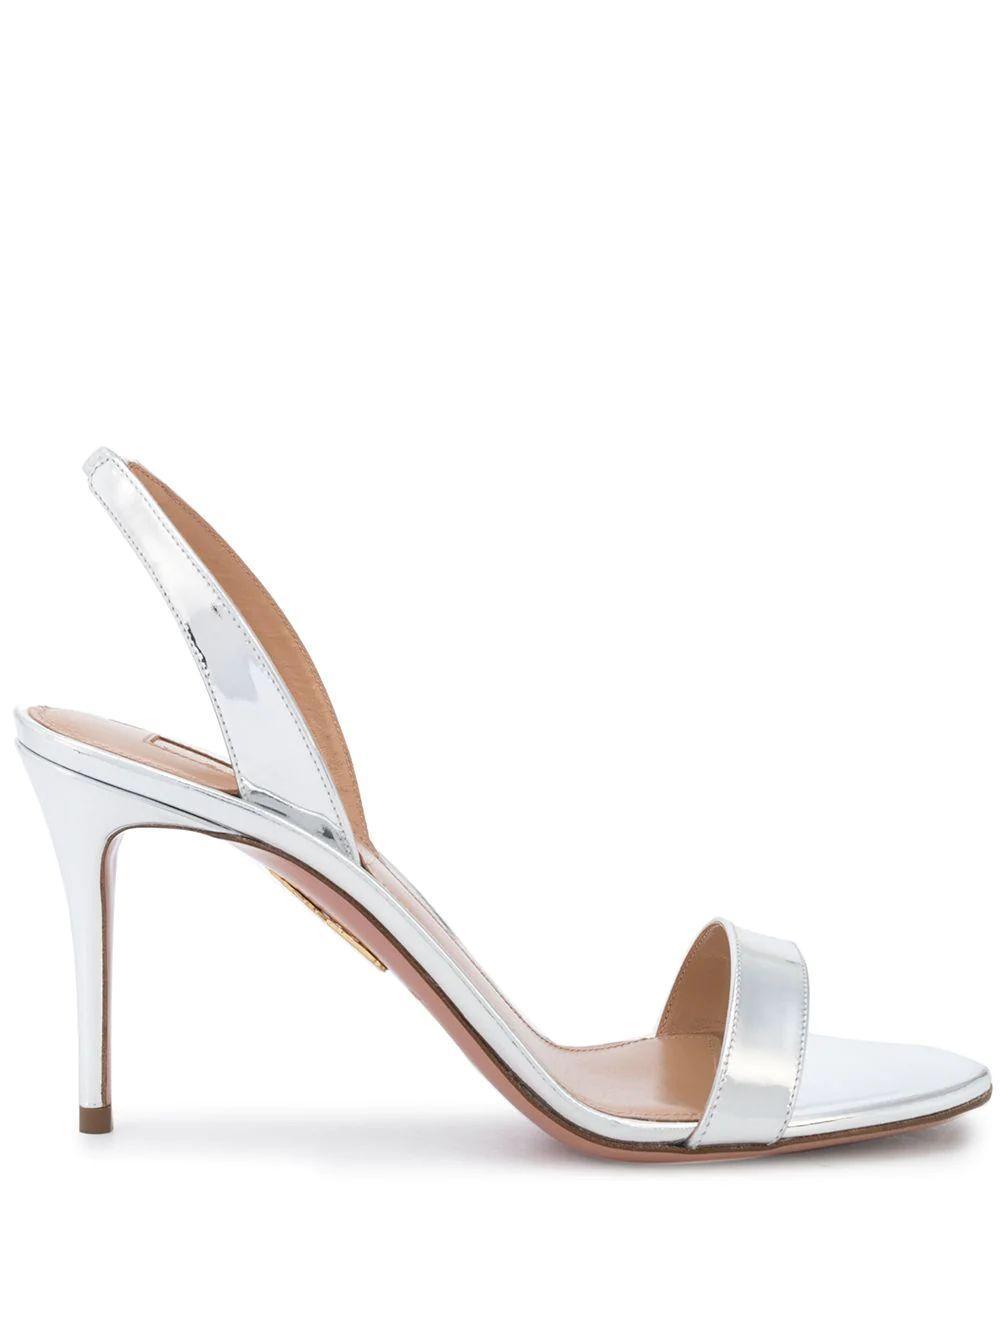 So Nude 85mm Sandal Item # SNUMIDS0-SPE-PF21